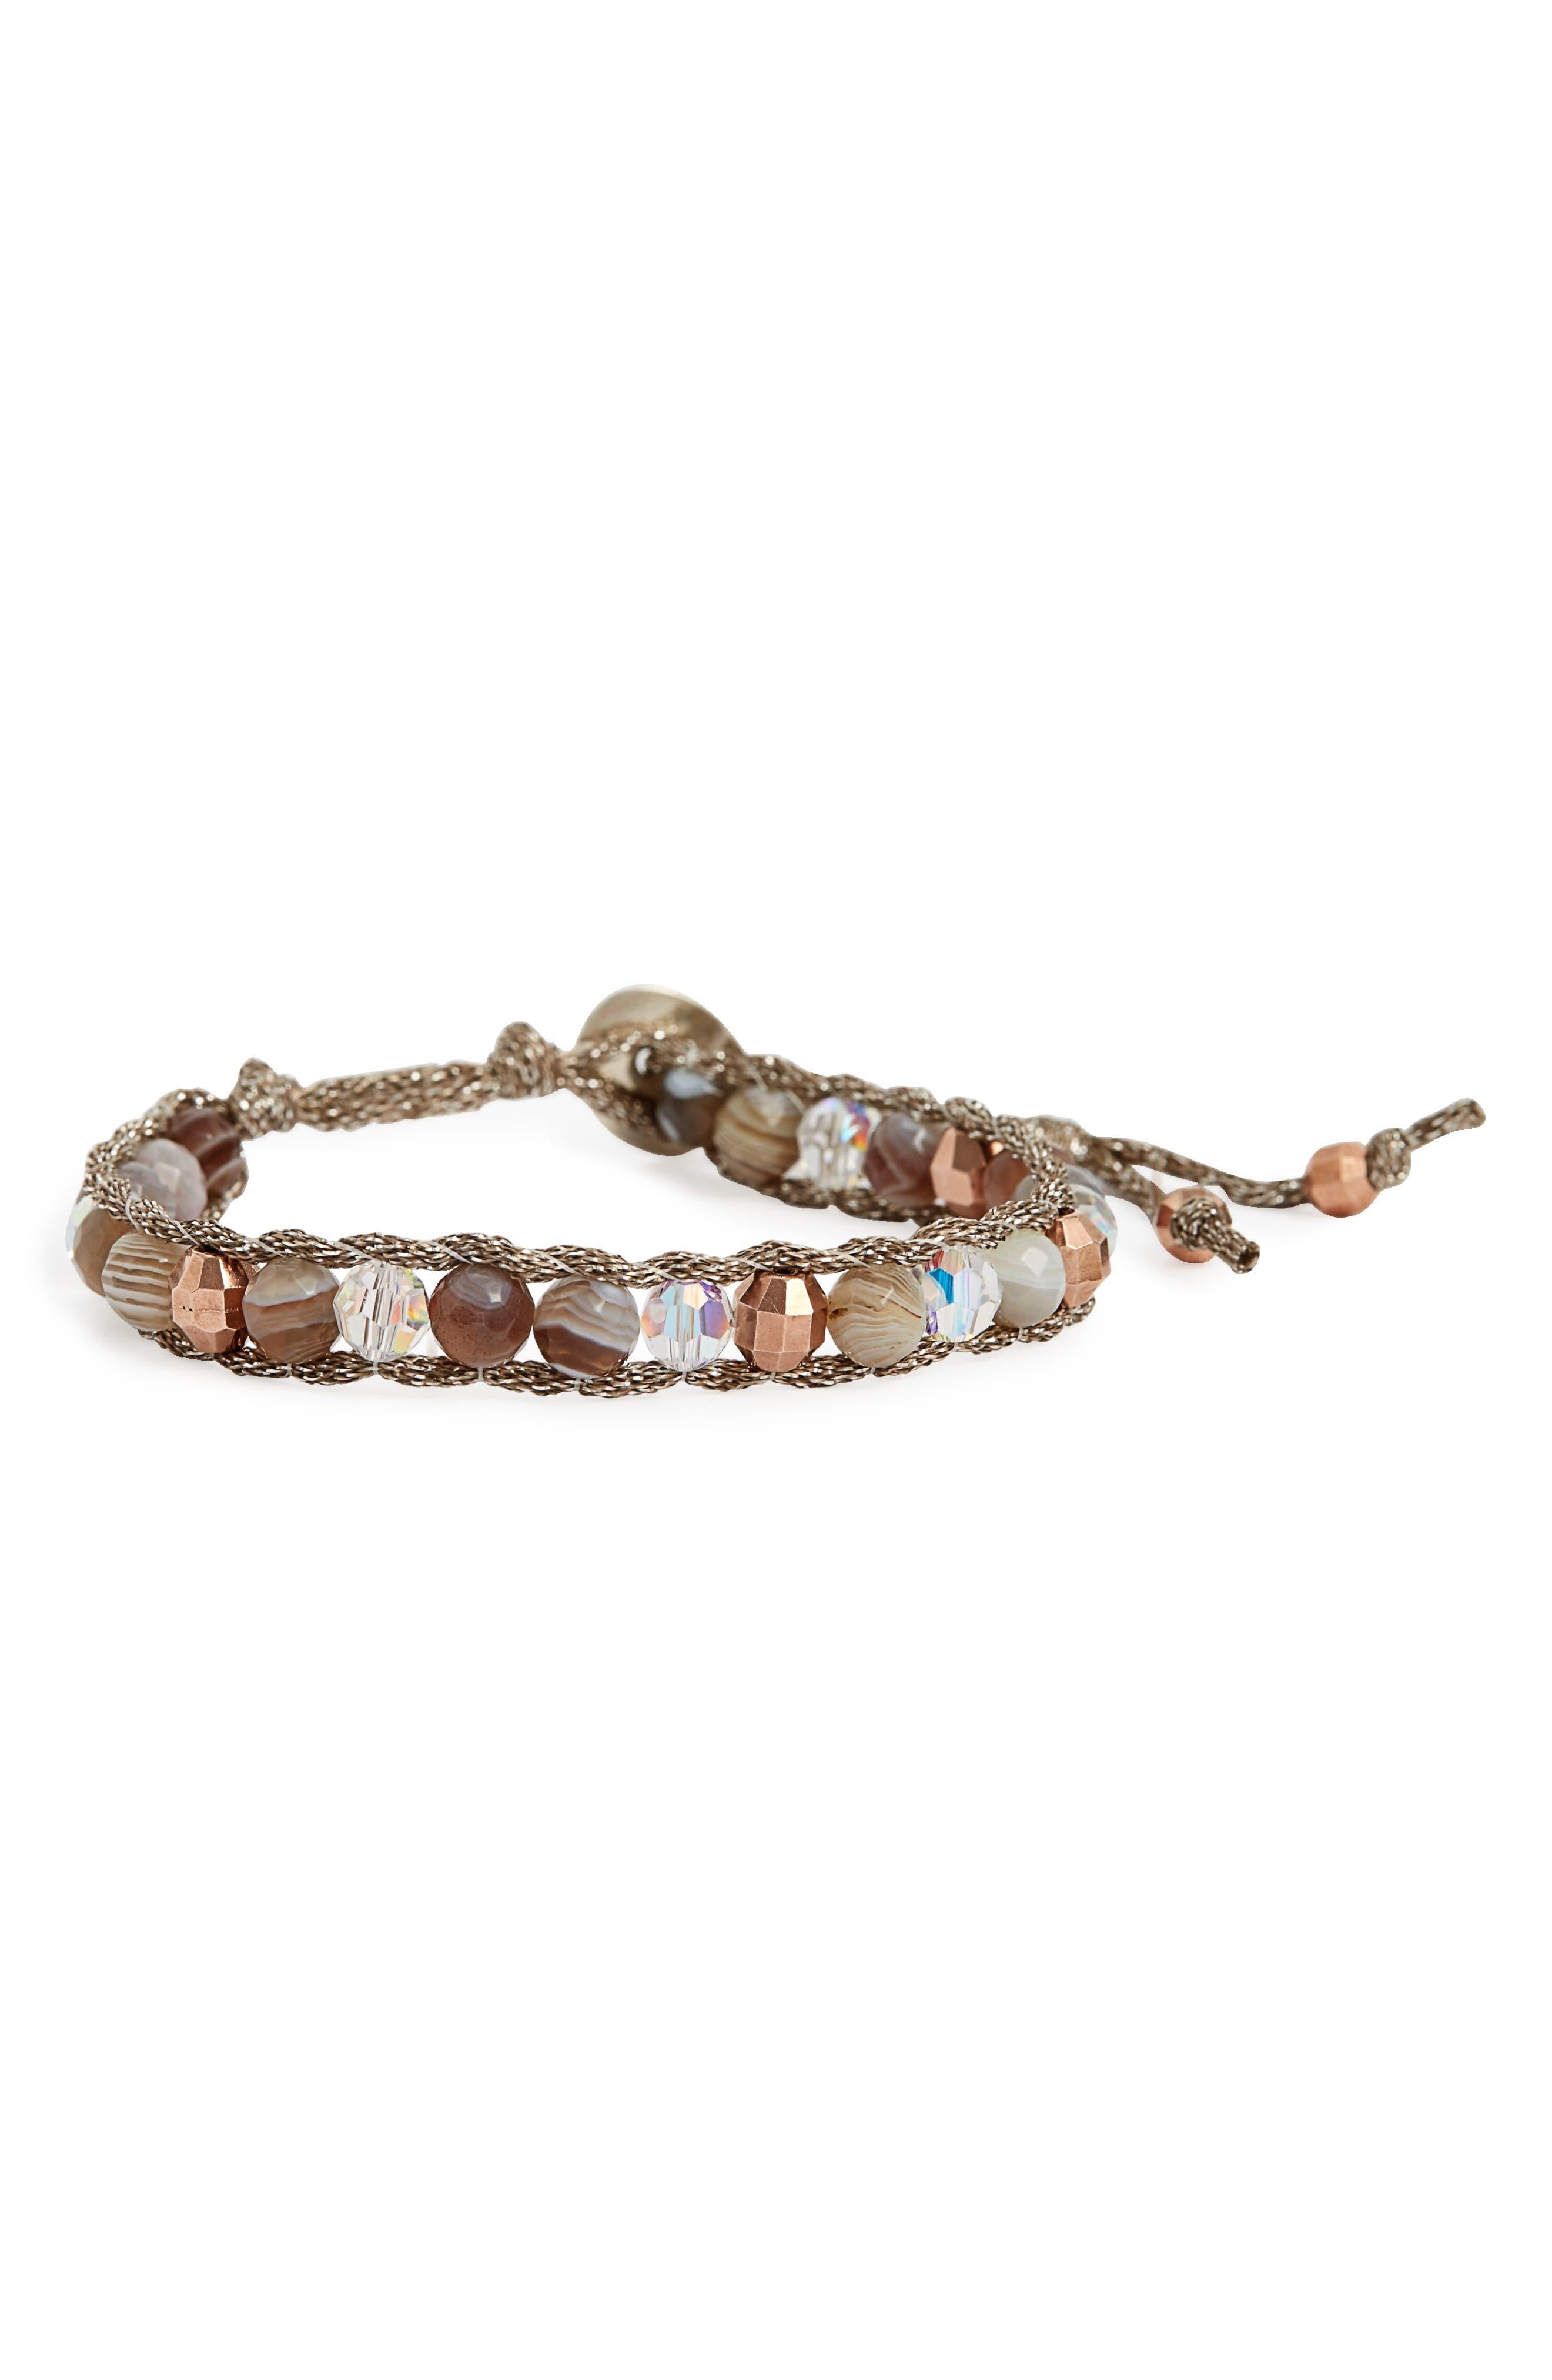 Agate & Crystal Bracelet,                             Main thumbnail 1, color,                             200